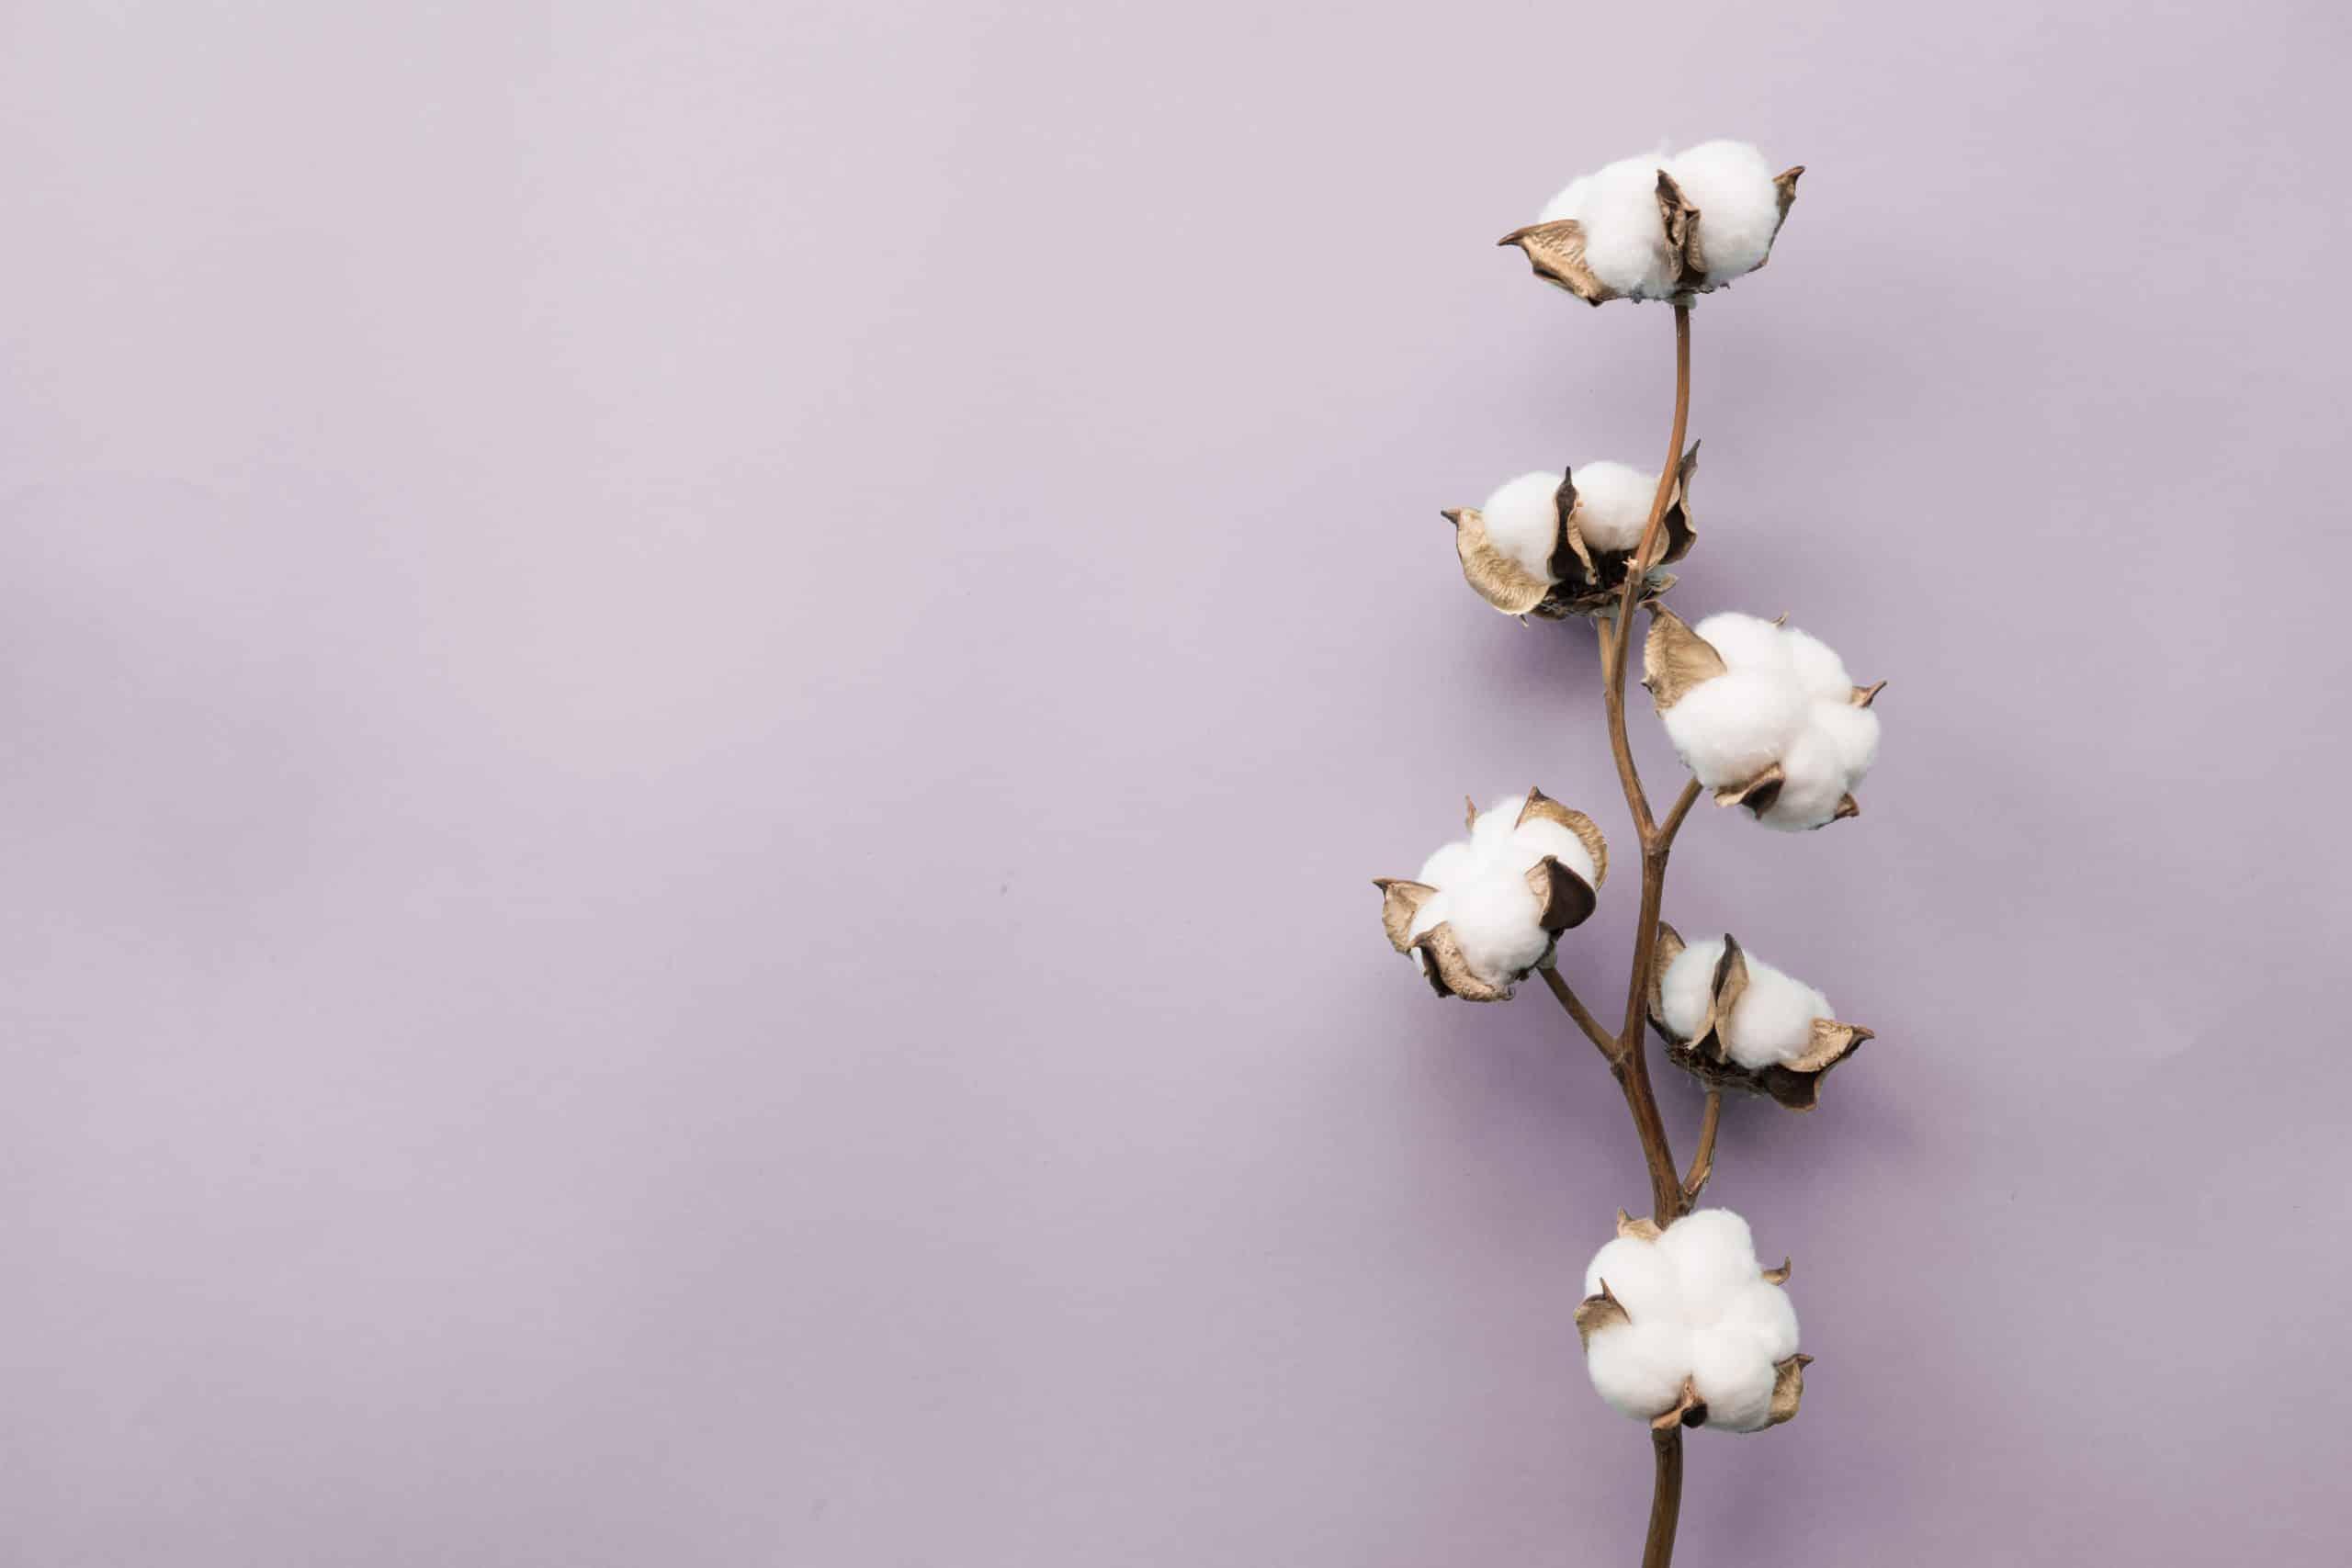 cotton-flower-lying-on-purple-background-NQLPU7B